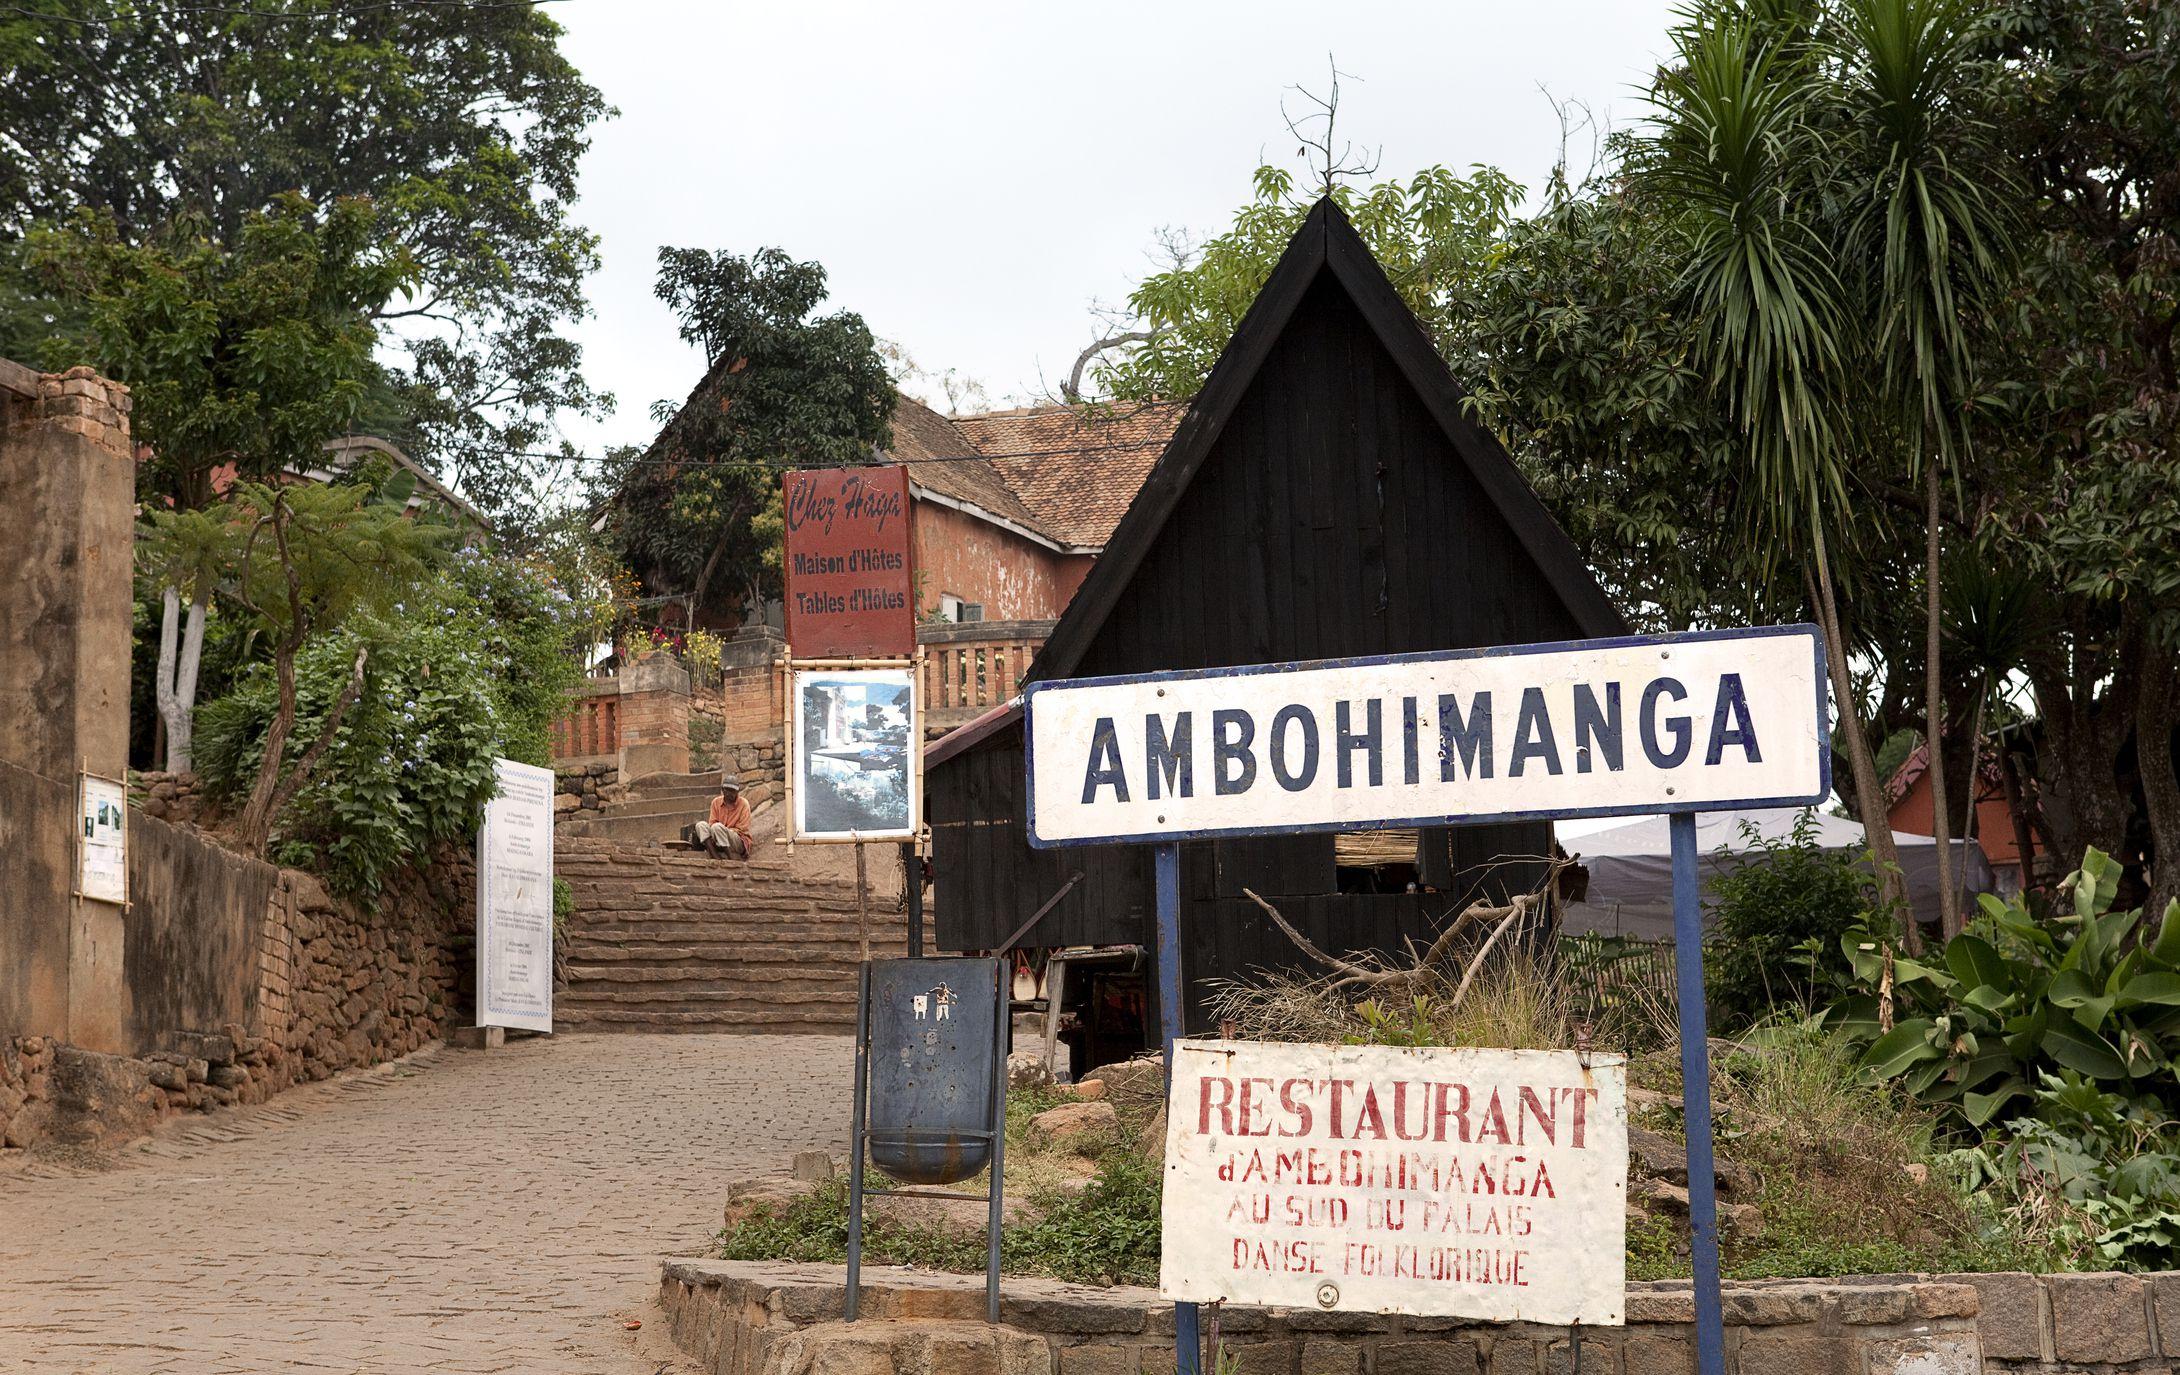 Ambohimanga village, Antananarivo